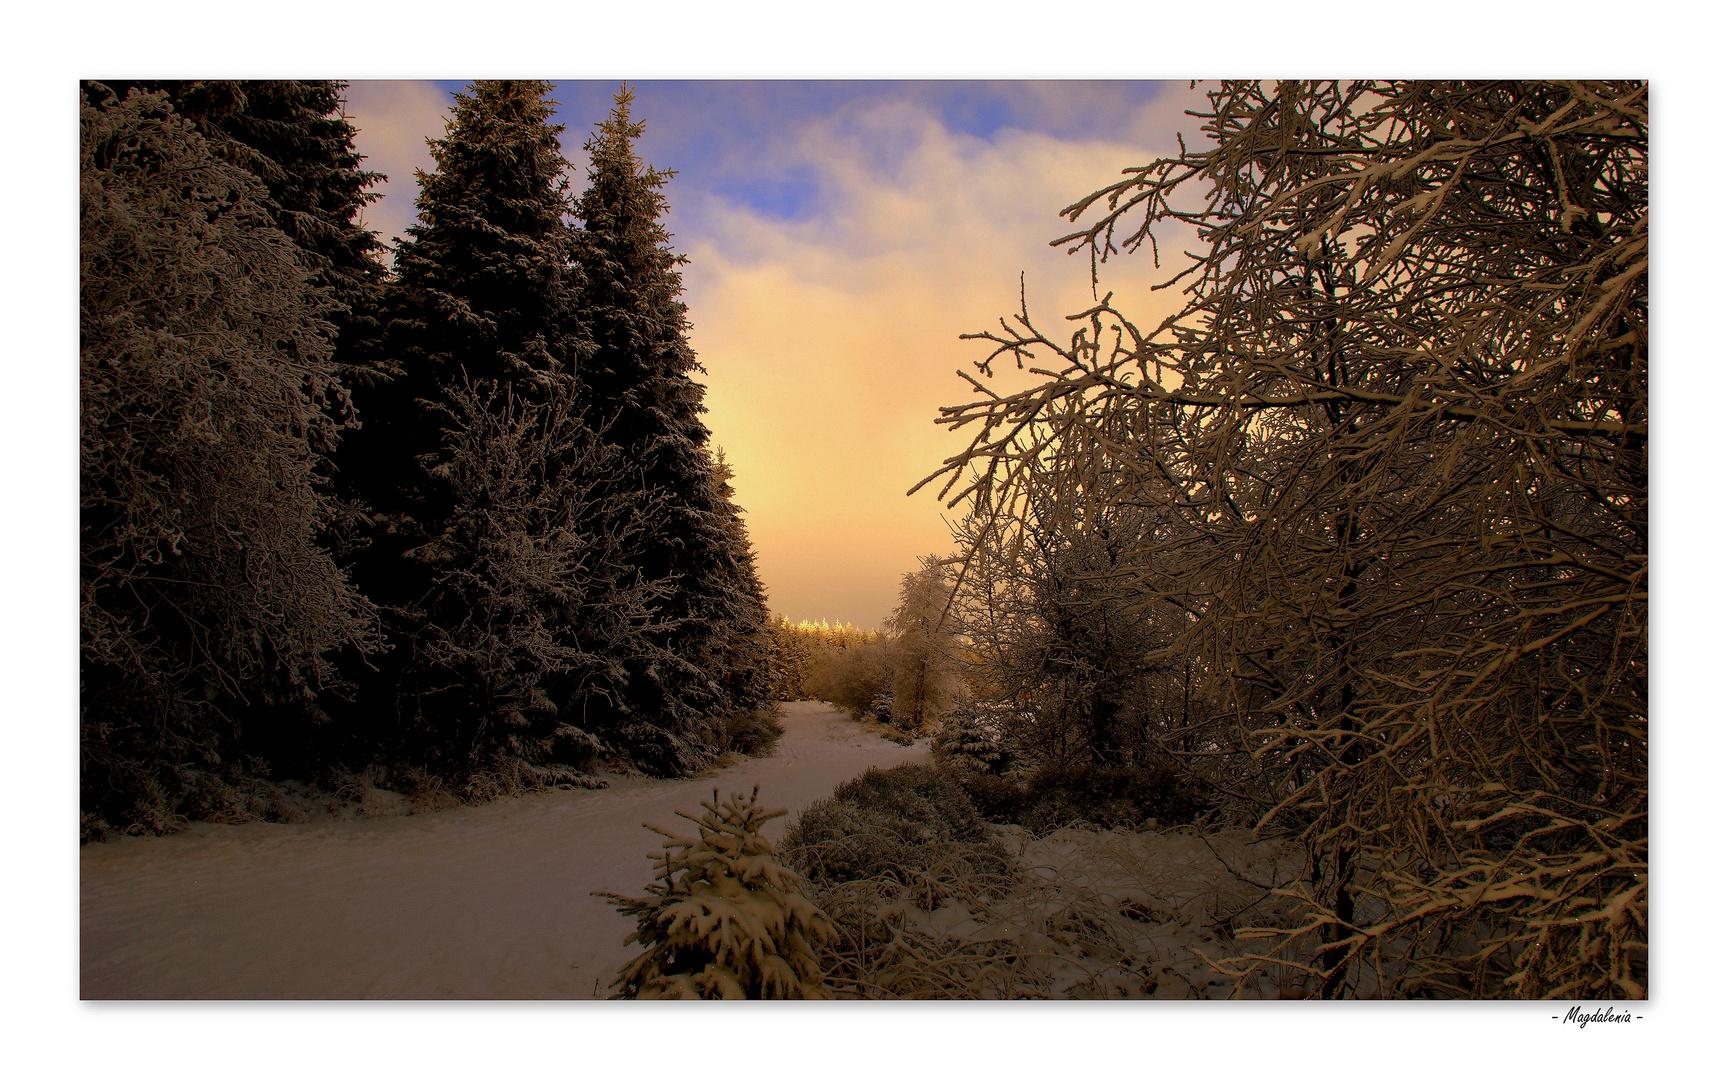 Enlacement hivernal